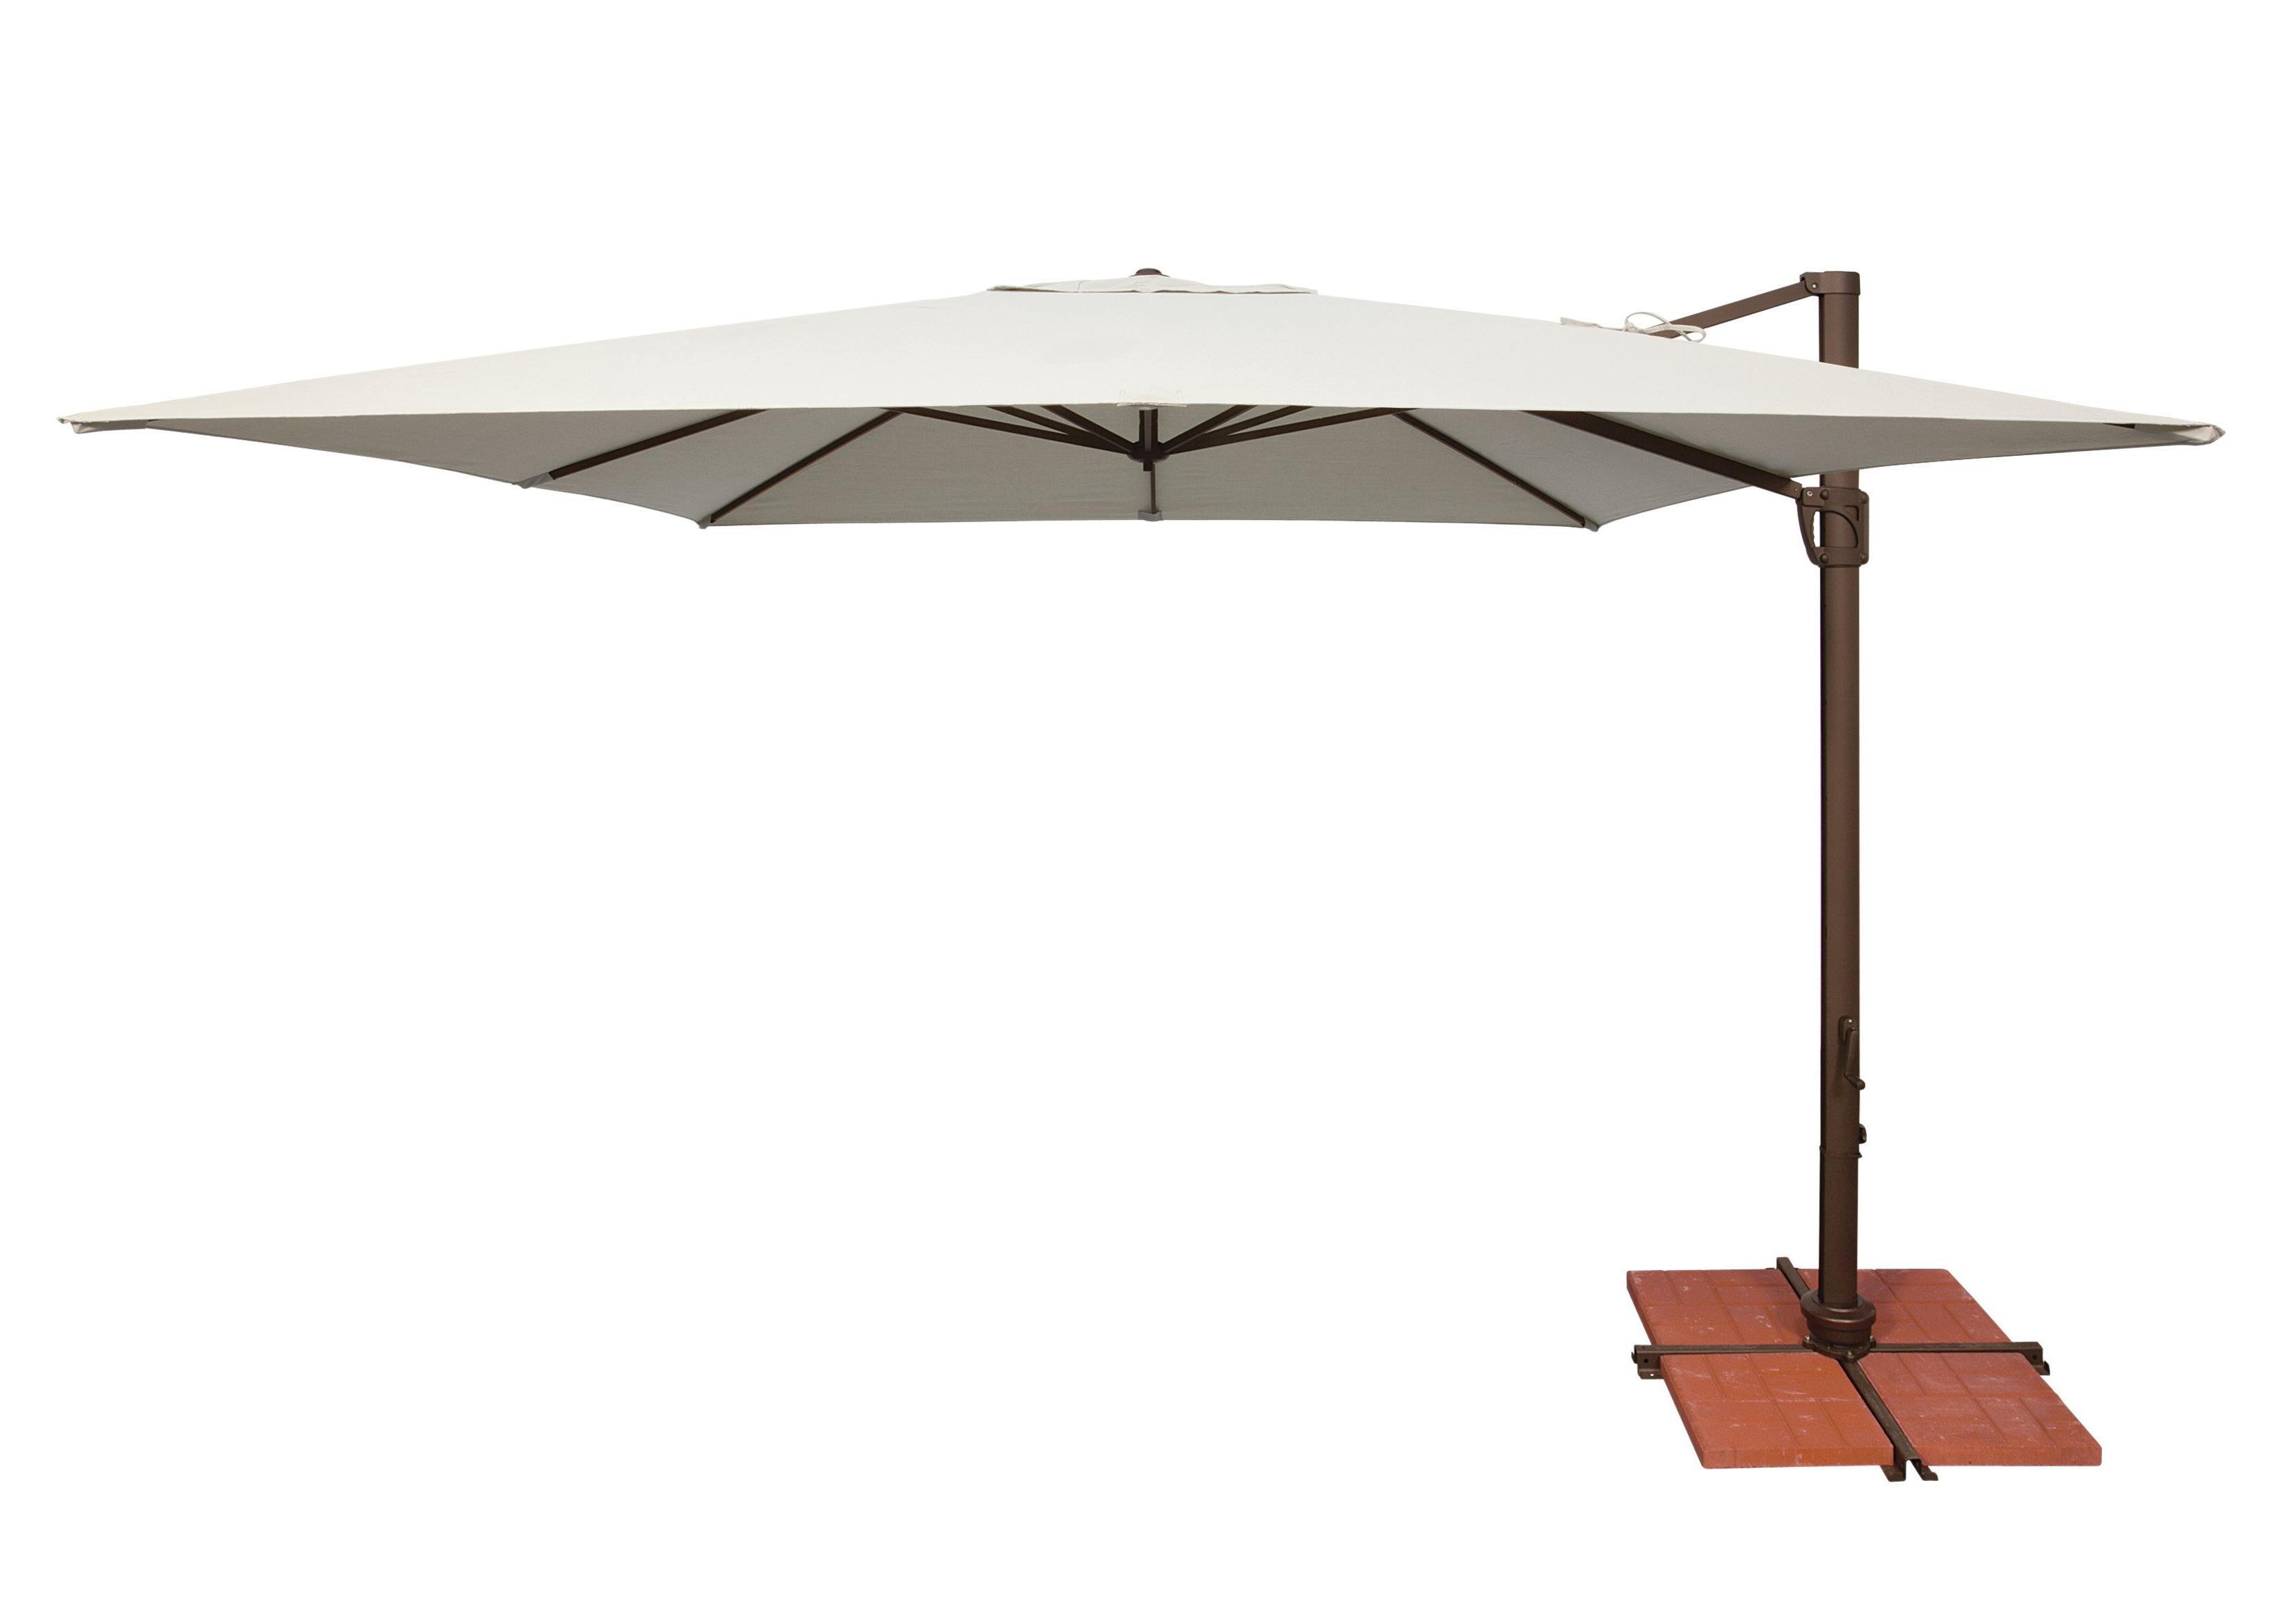 Famous Maidste Square Cantilever Umbrellas Regarding Windell 10' Square Cantilever Umbrella (View 12 of 20)